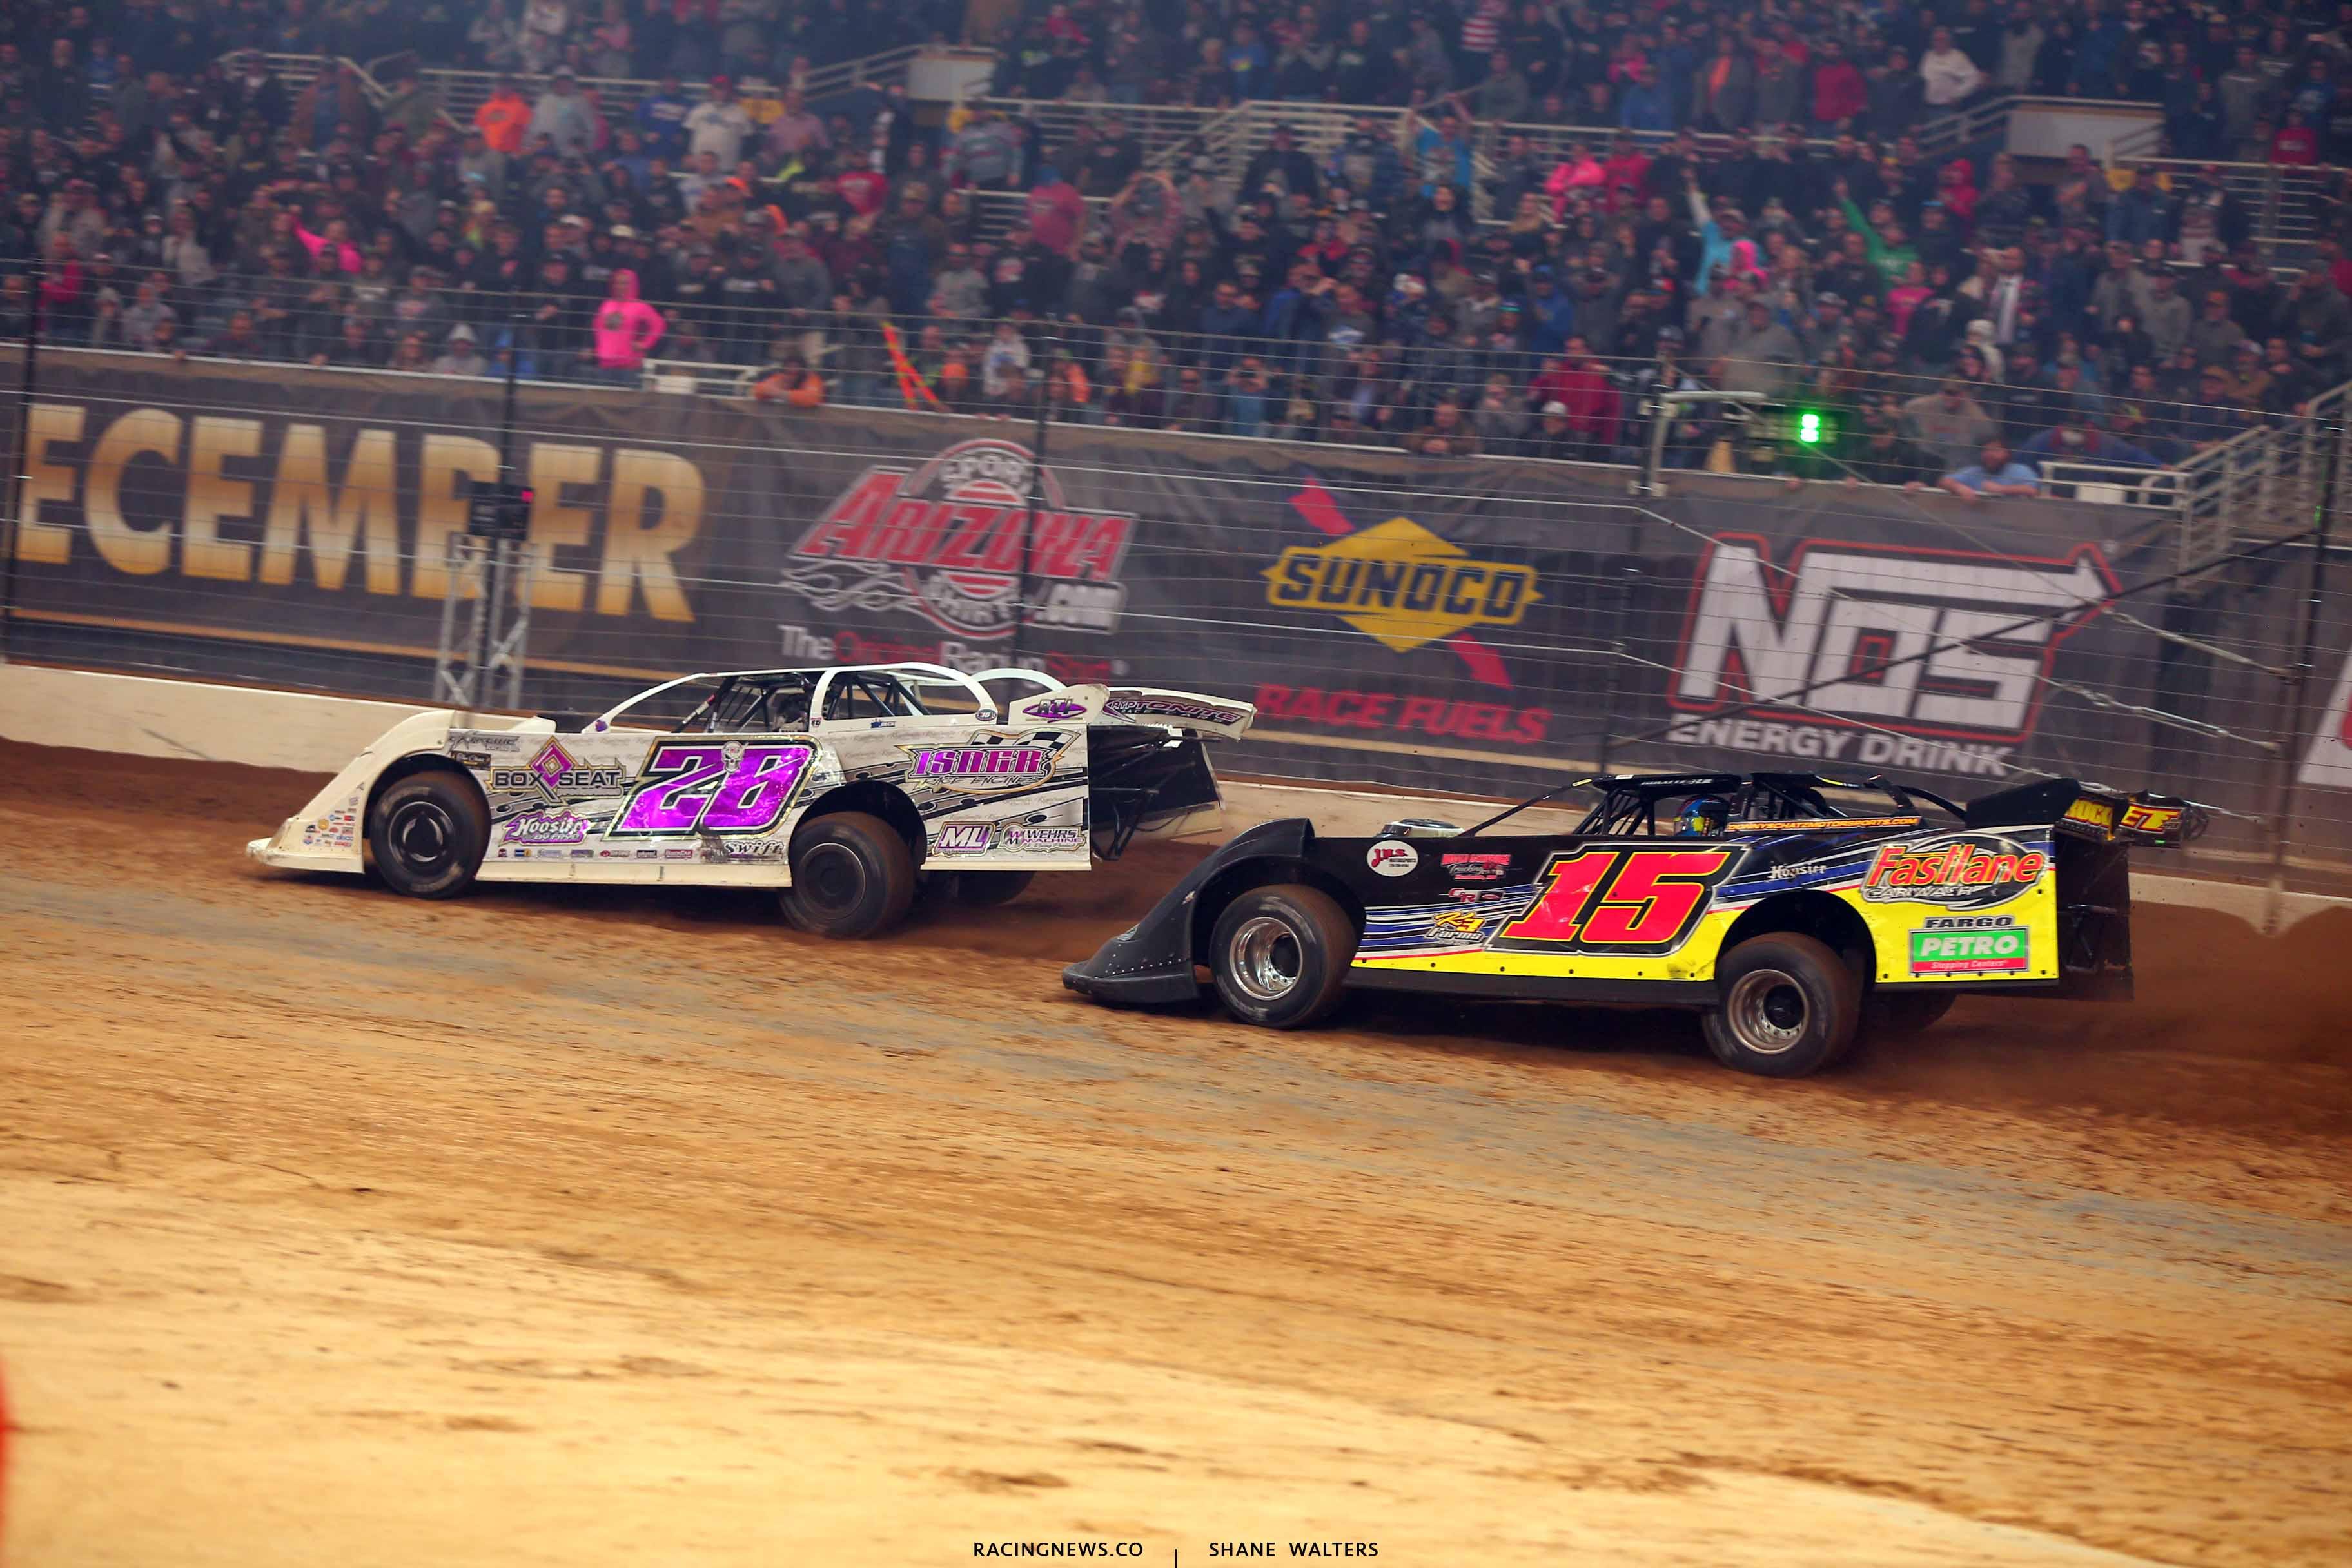 Tyler Carpenter and Brandon Sheppard in the Gateway Dirt Nationals 2657